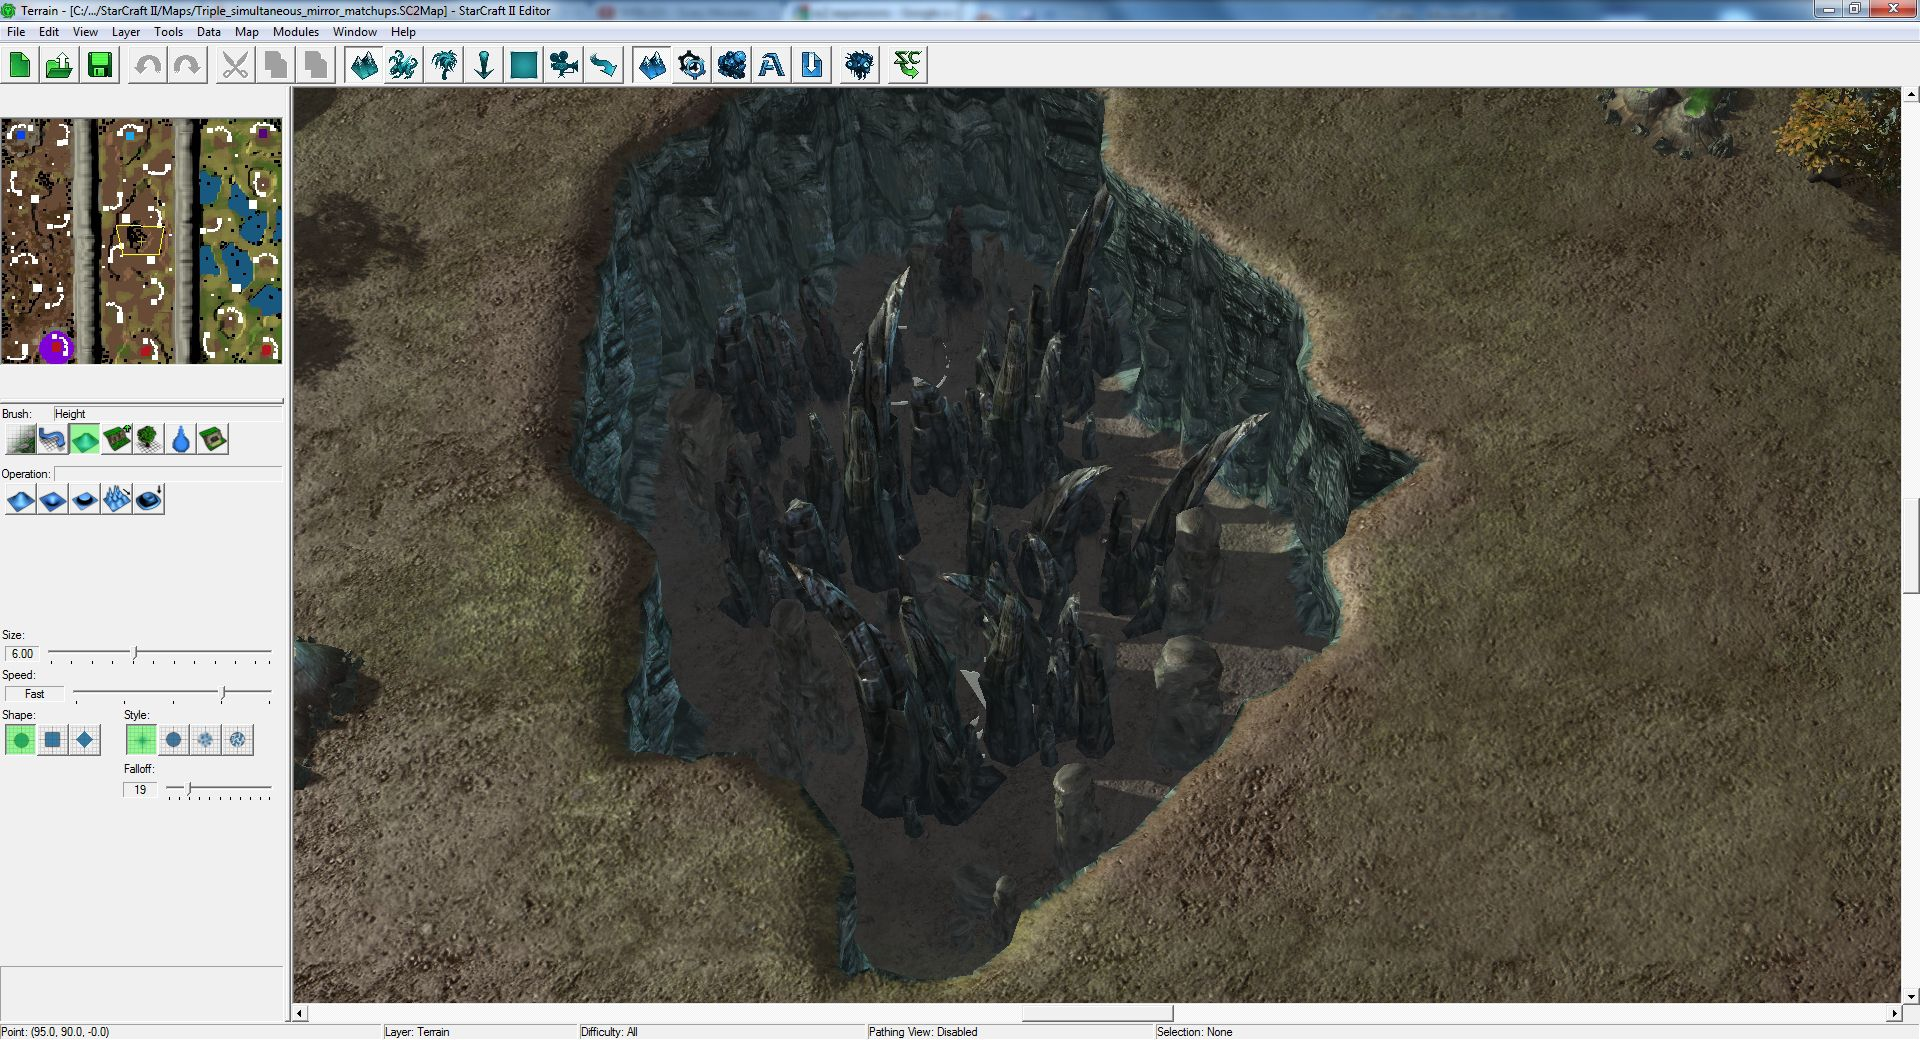 sc2 editor sc2 screenshot - Gamingcfg com